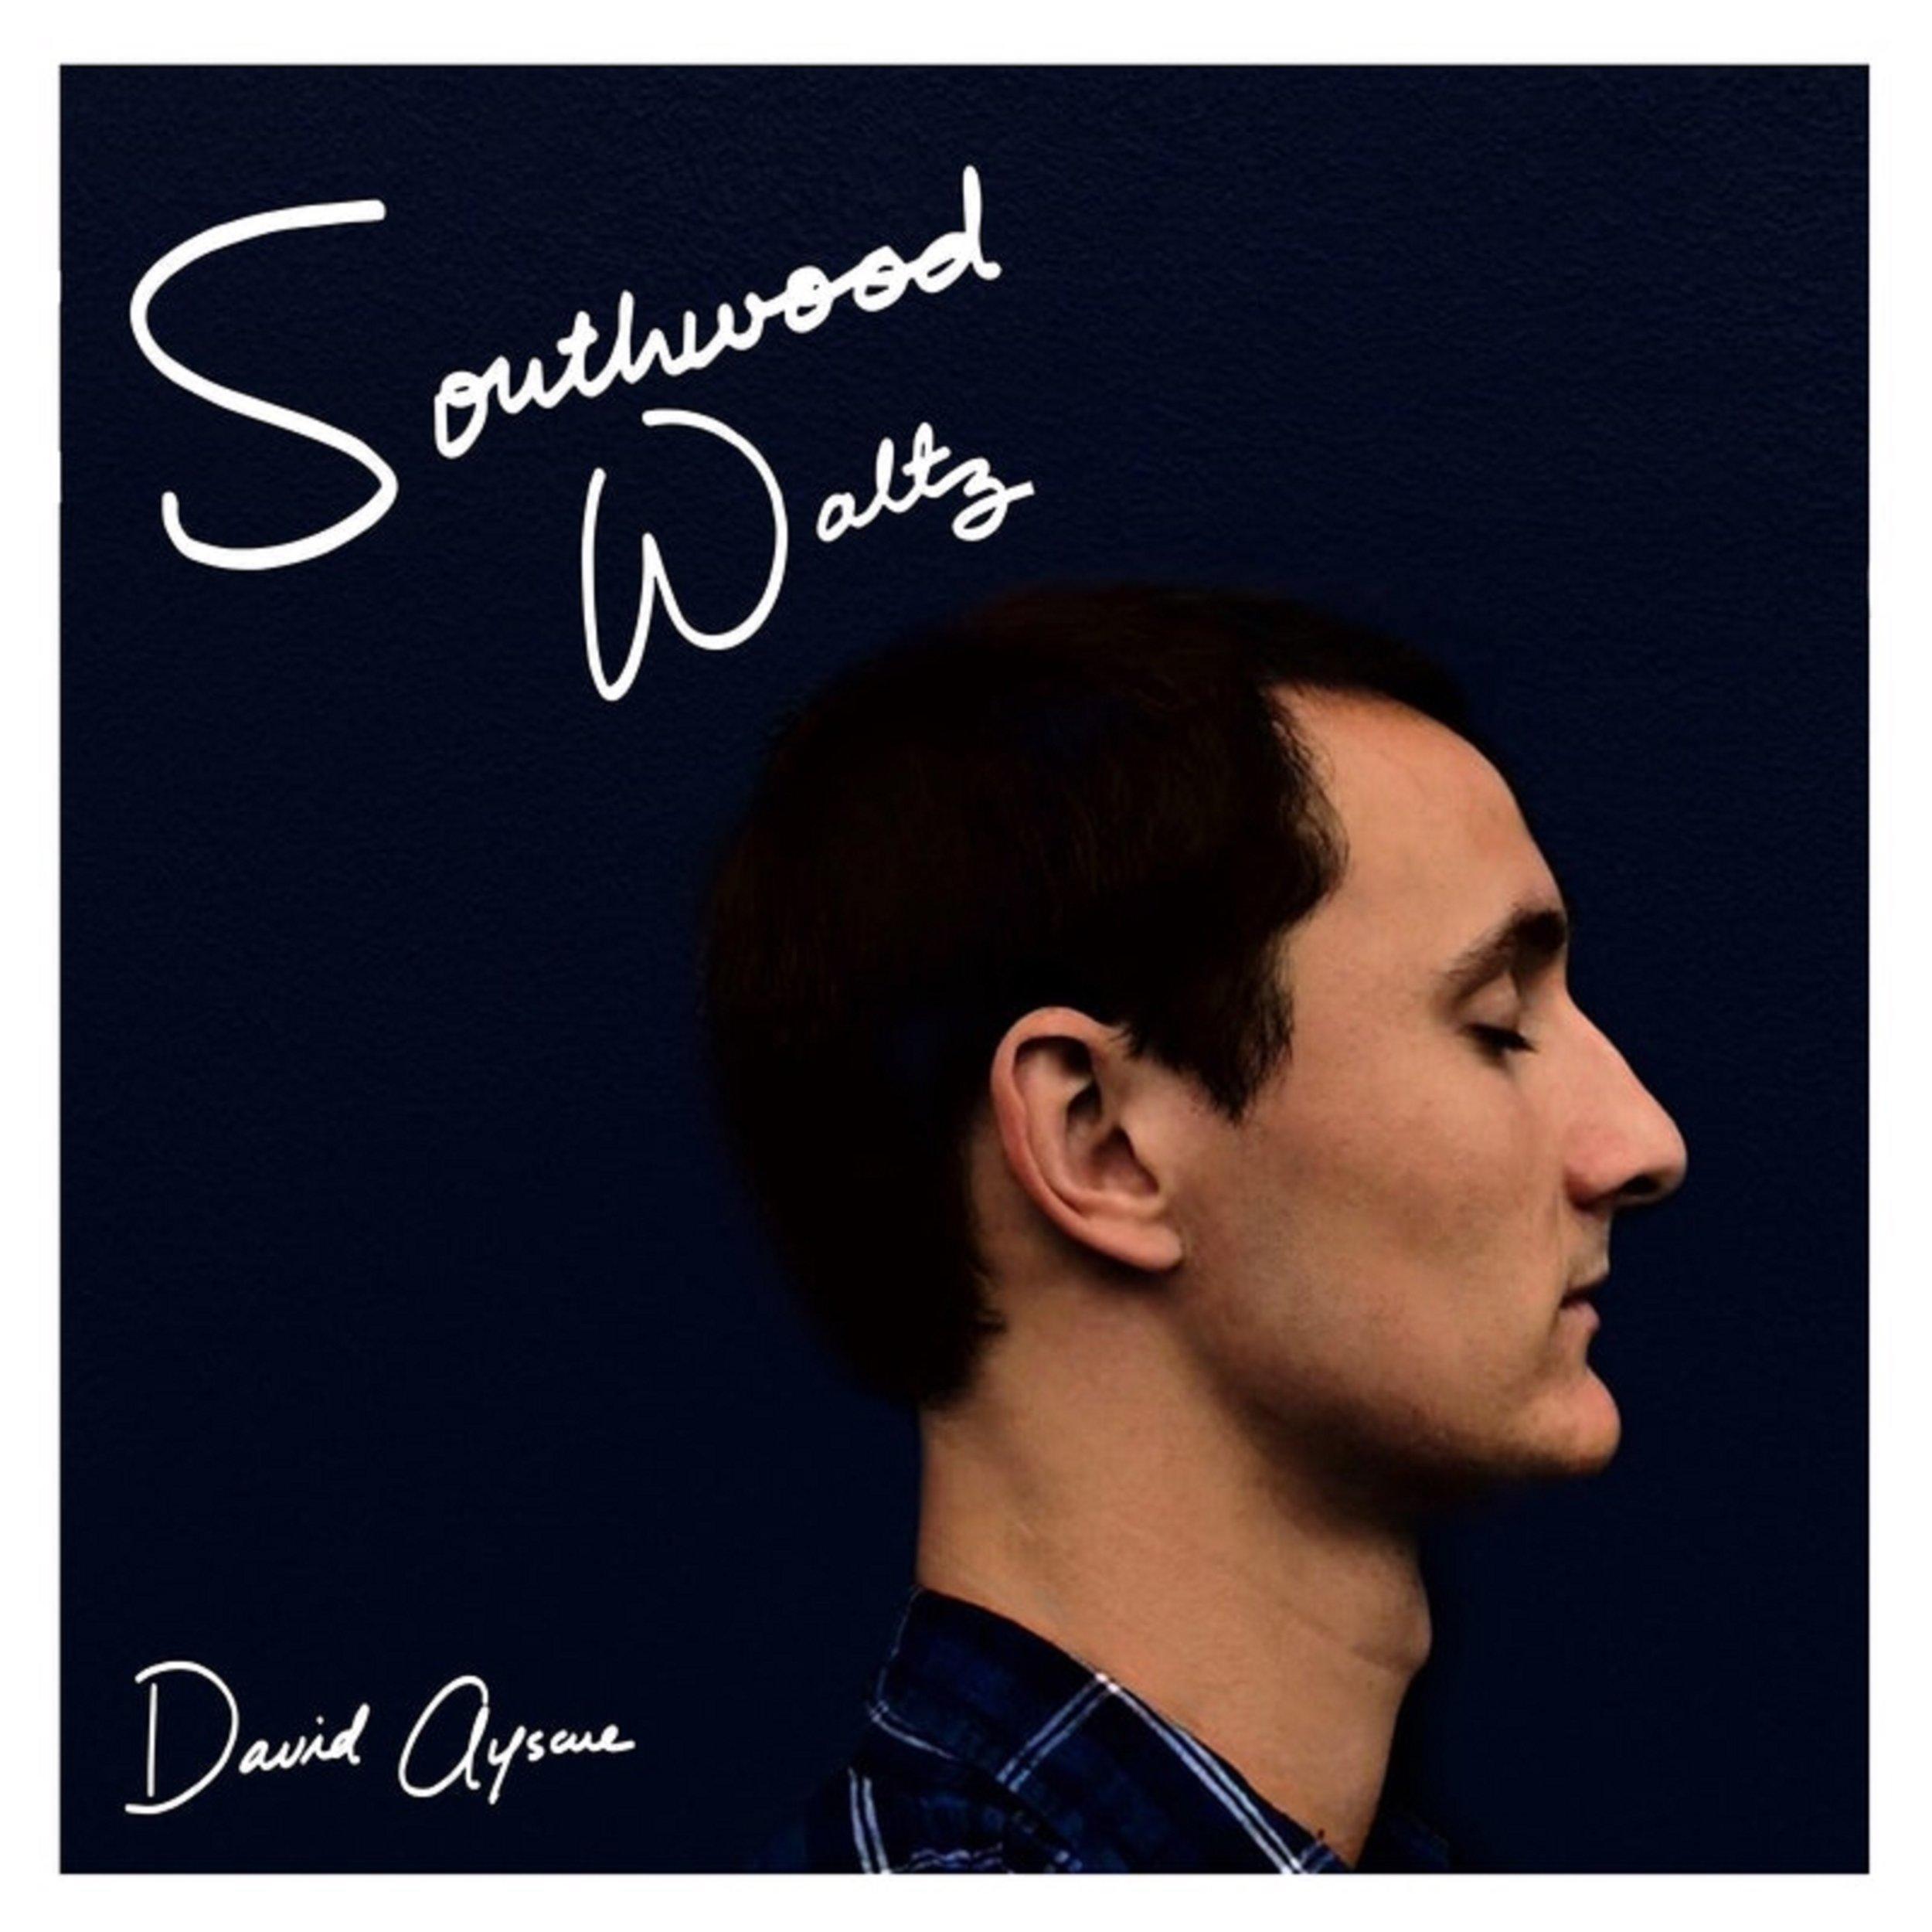 David Ayscue: Southwood Waltz (2019)  Mixing